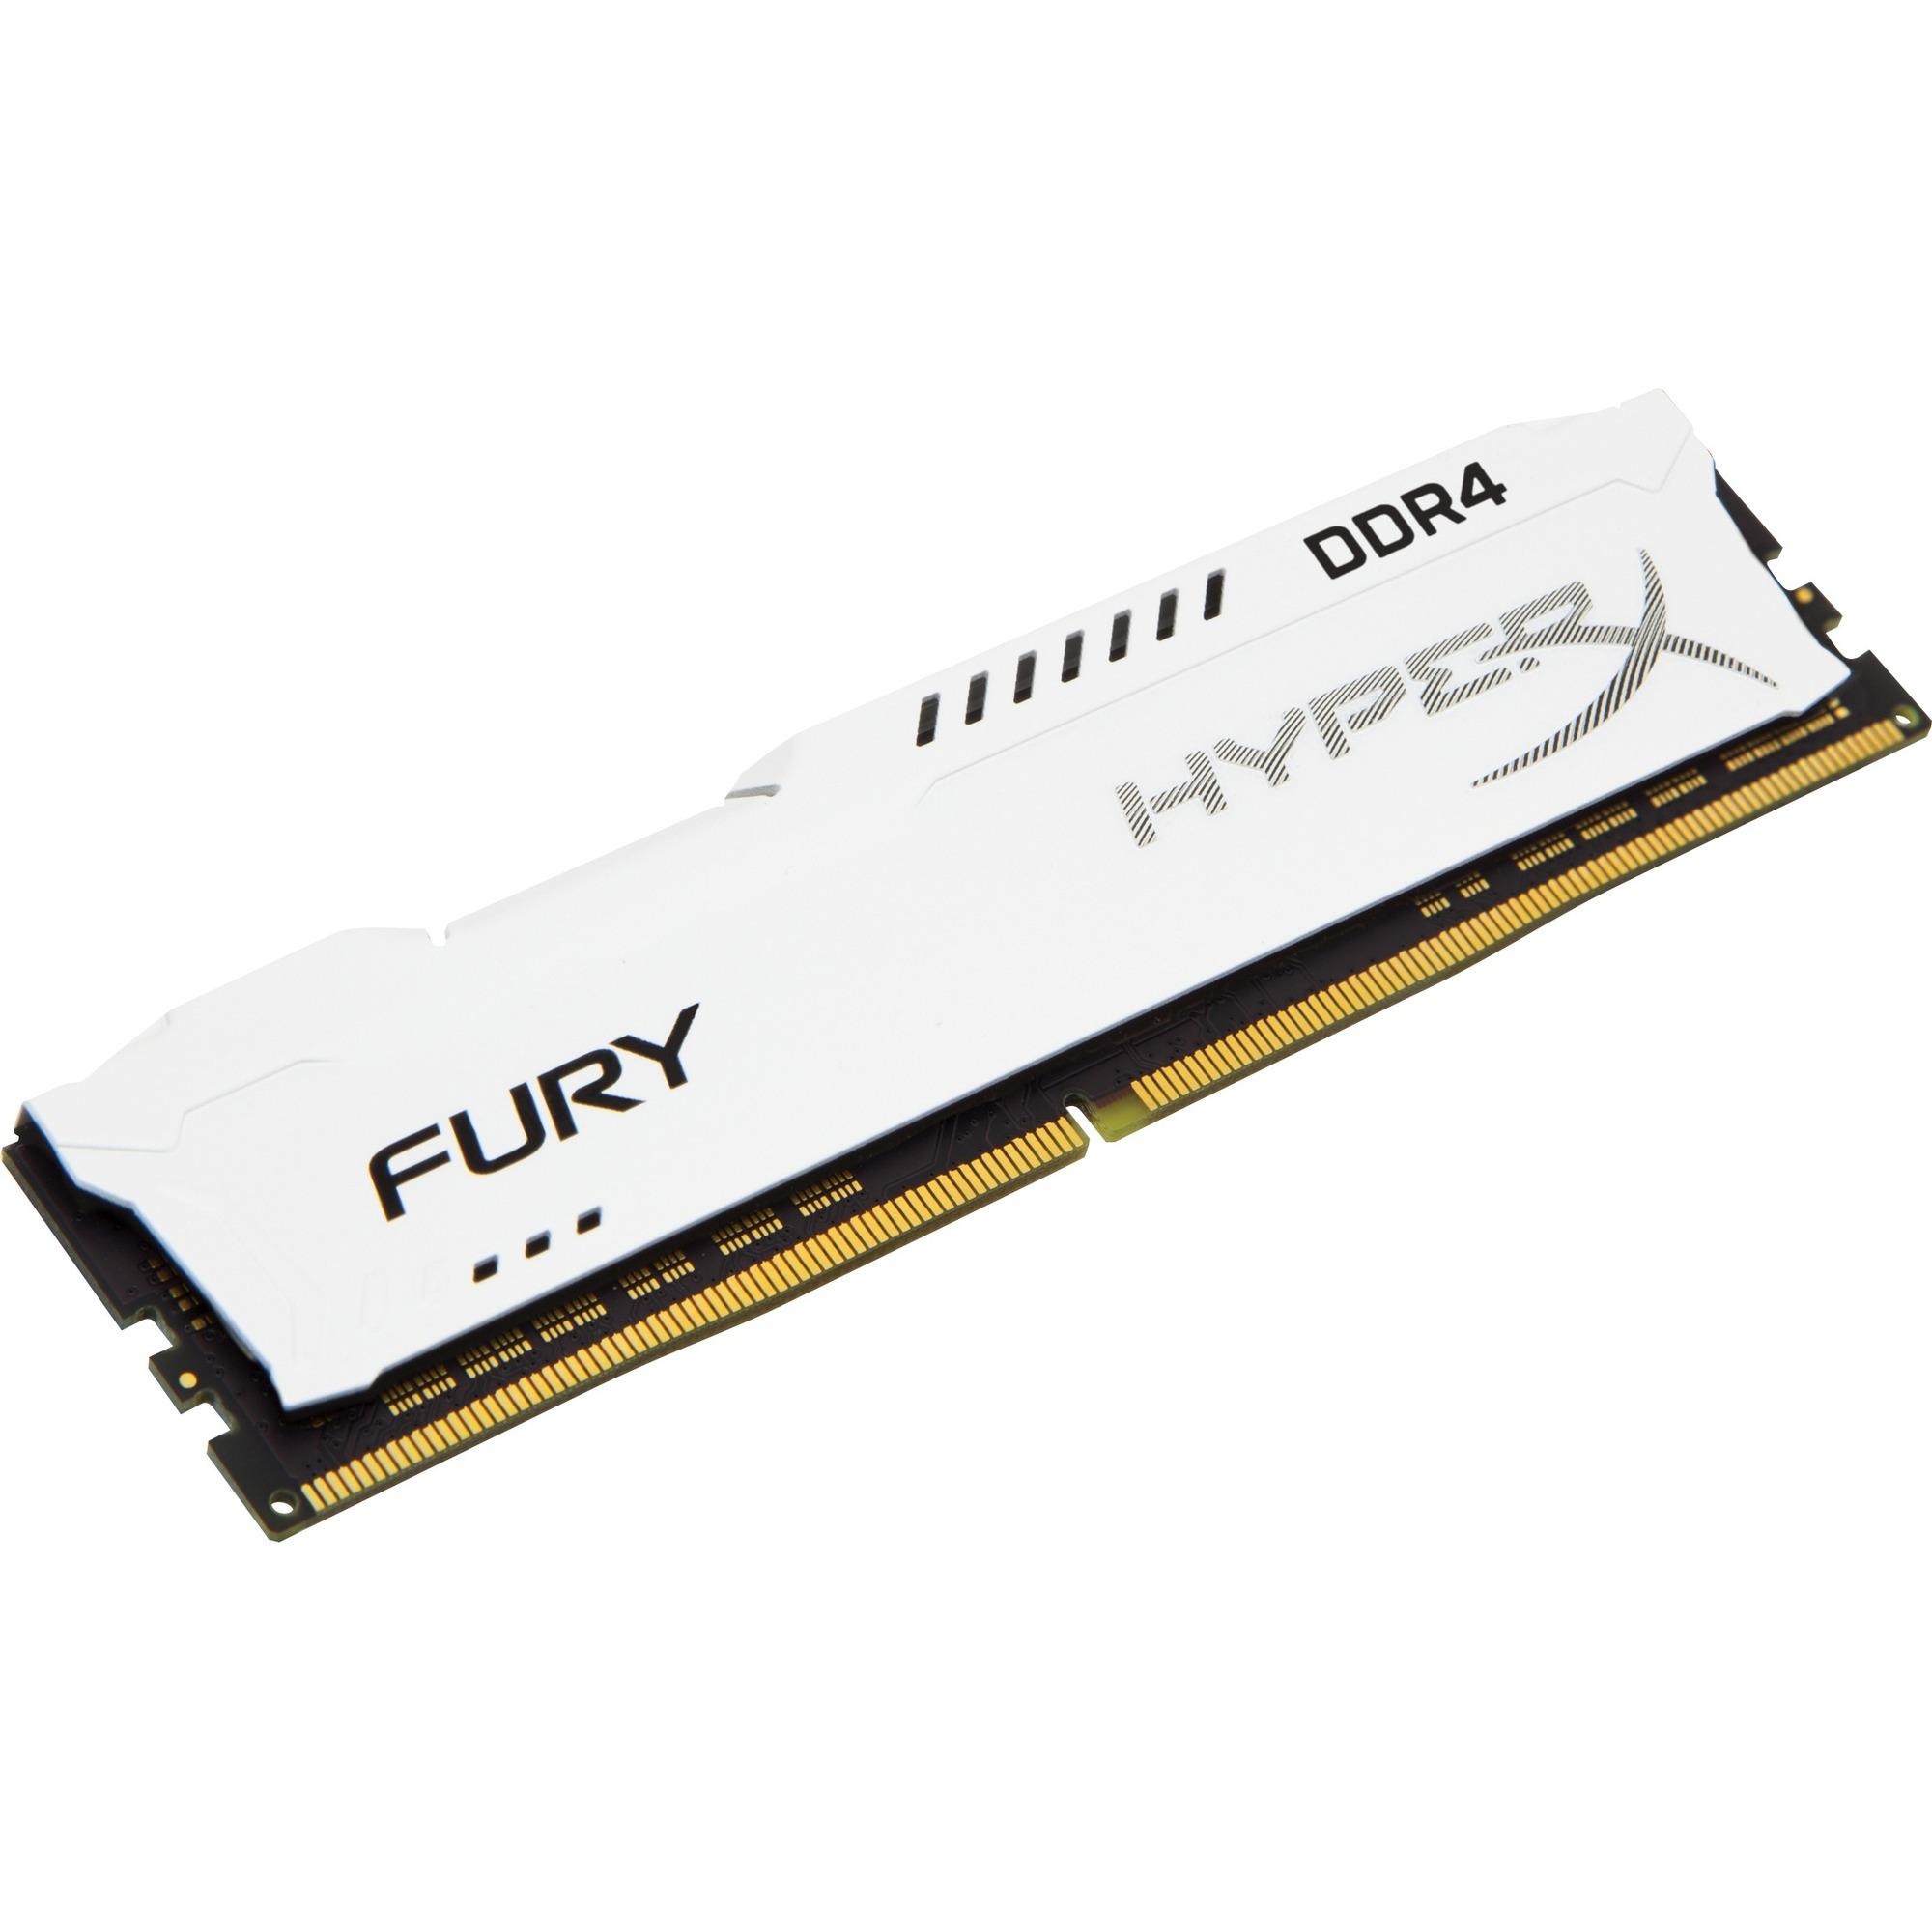 Kingston HyperX Fury RAM Module - 16 GB 1 x 16 GB - DDR4 SDRAM - 2400 MHz DDR4-2400/PC4-19200 - 1.20 V - Non-ECC - Unbuffered - CL15 - 288-pin - DIMM